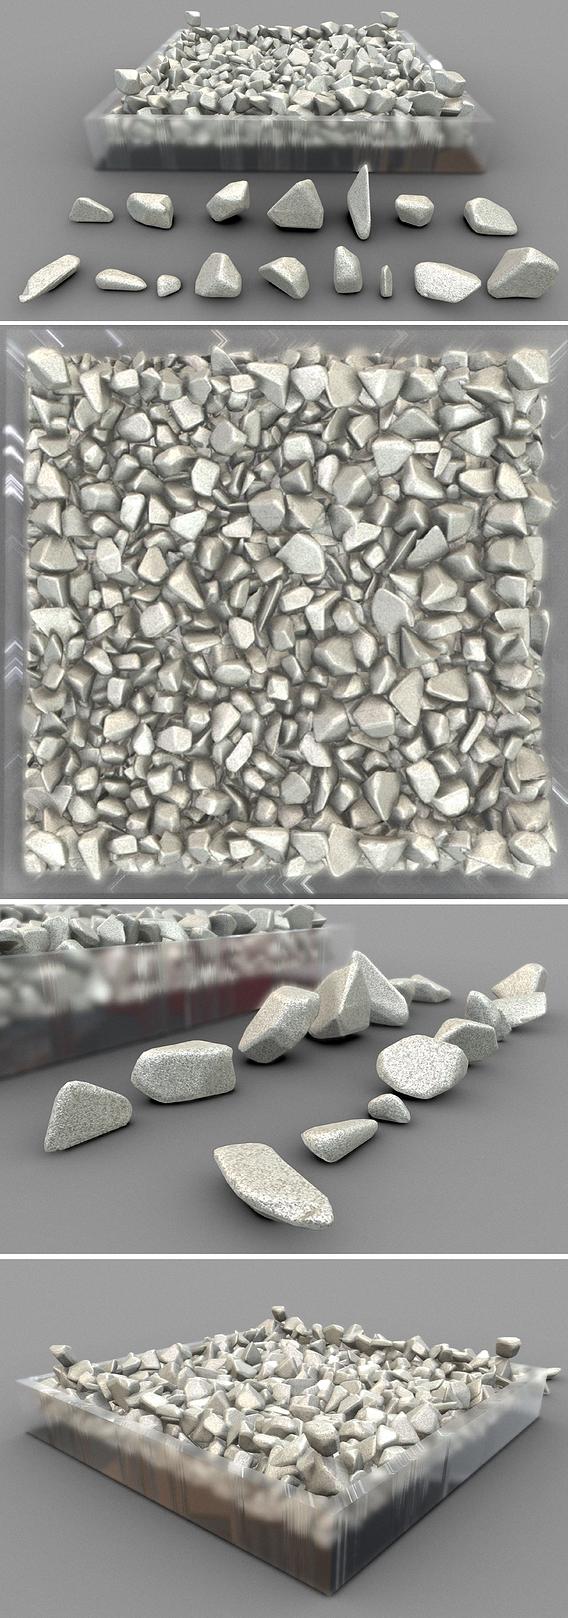 16 different shaped sandstones